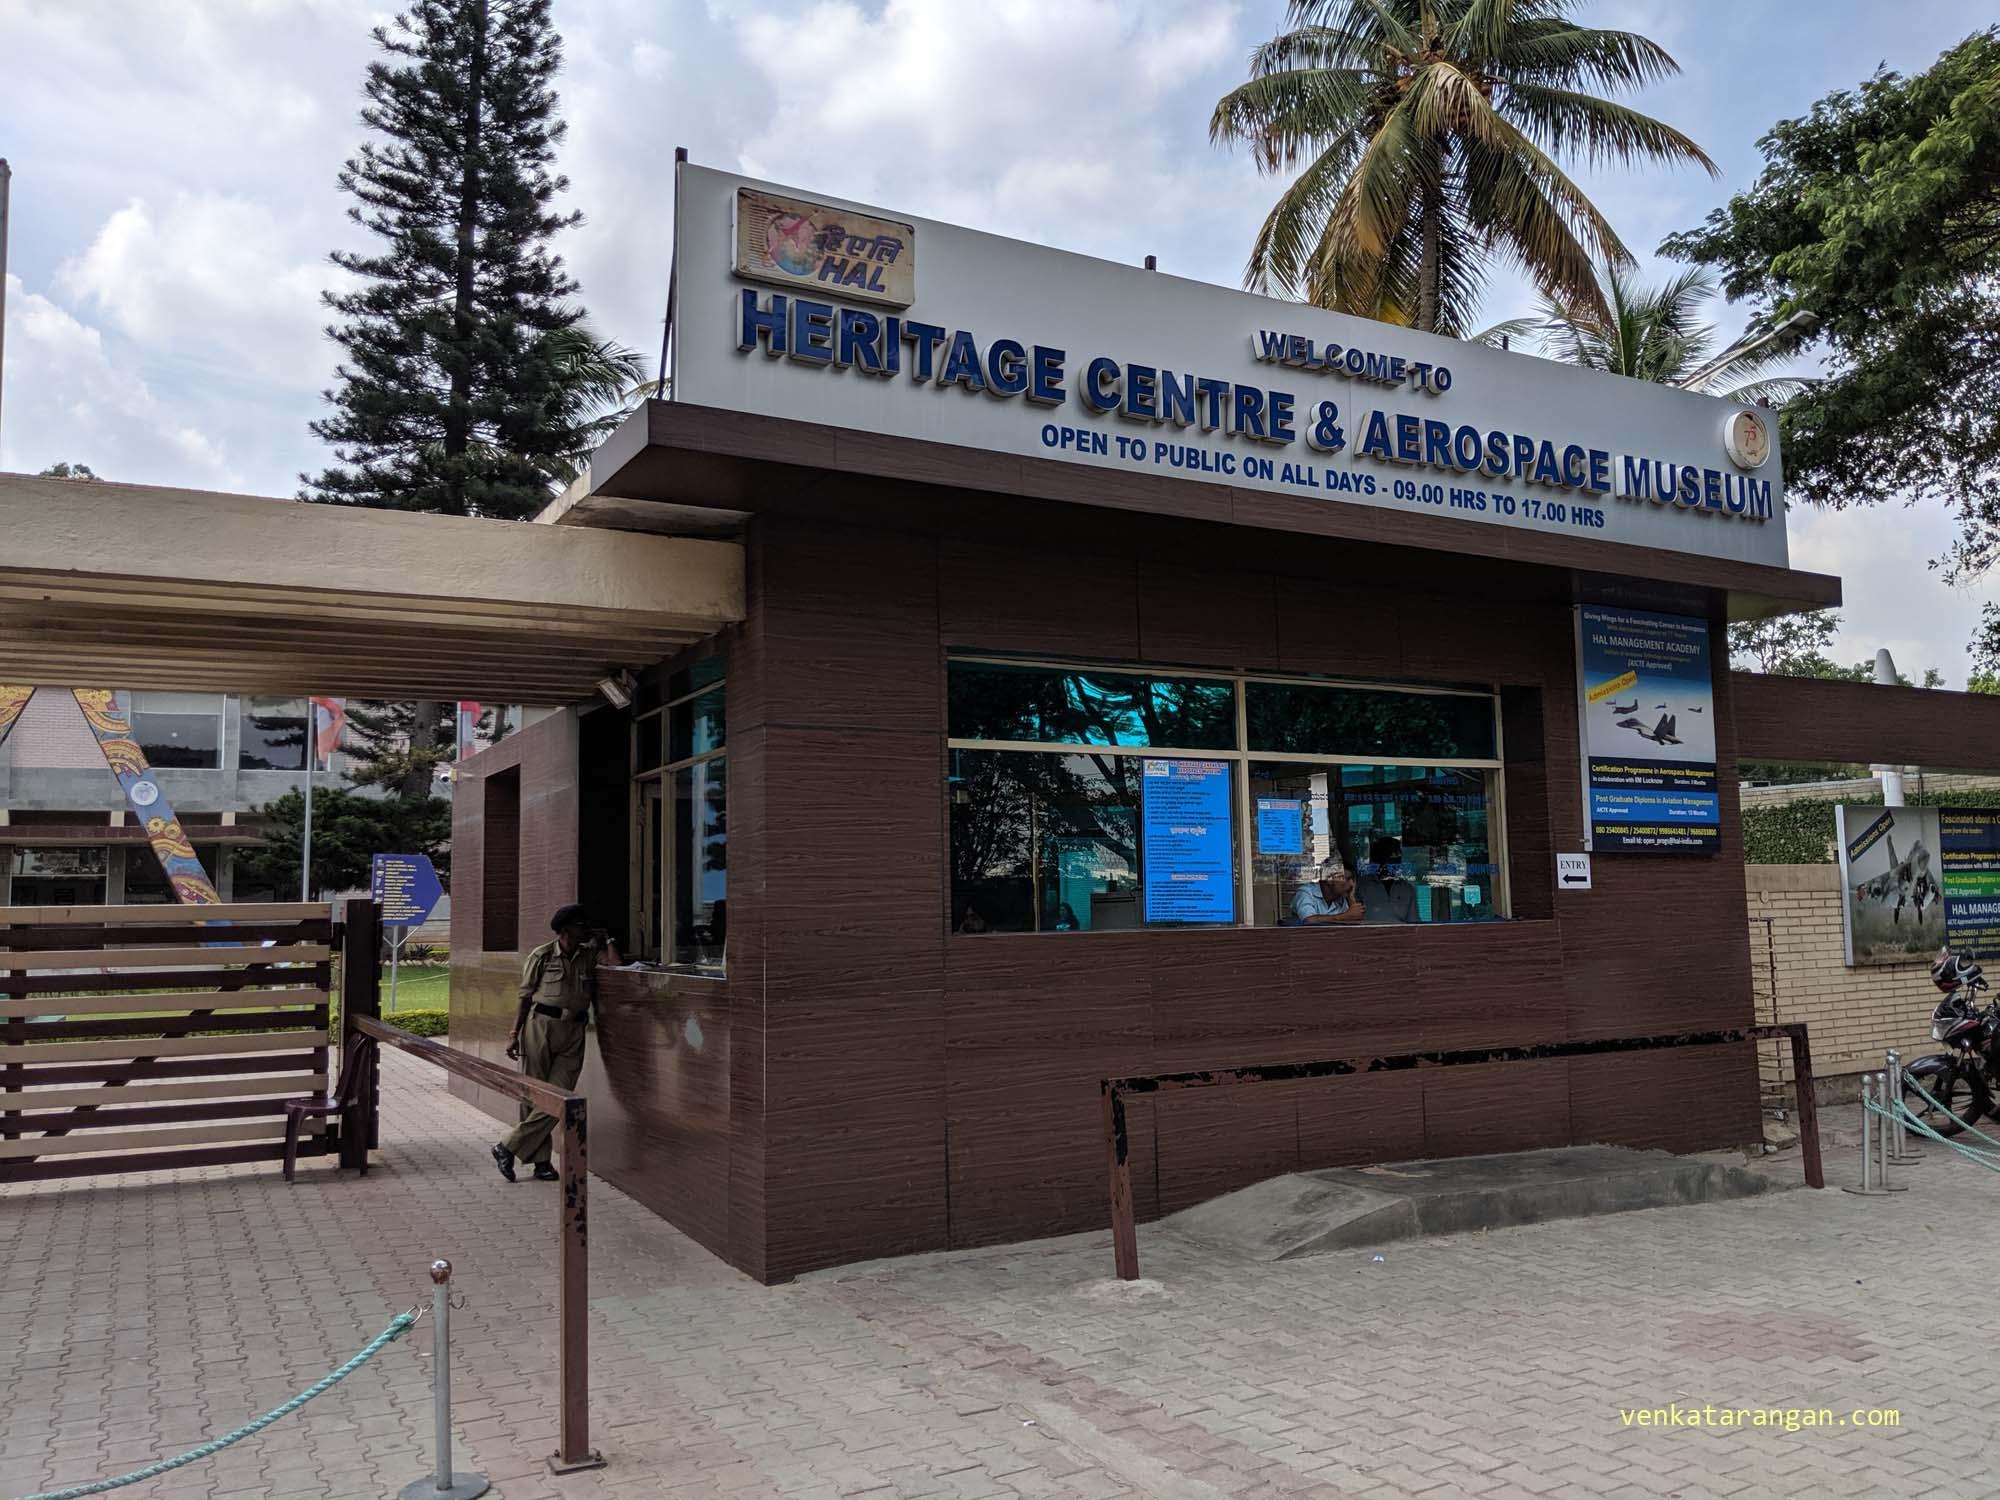 HAL Aerospace Museum, Bengaluru